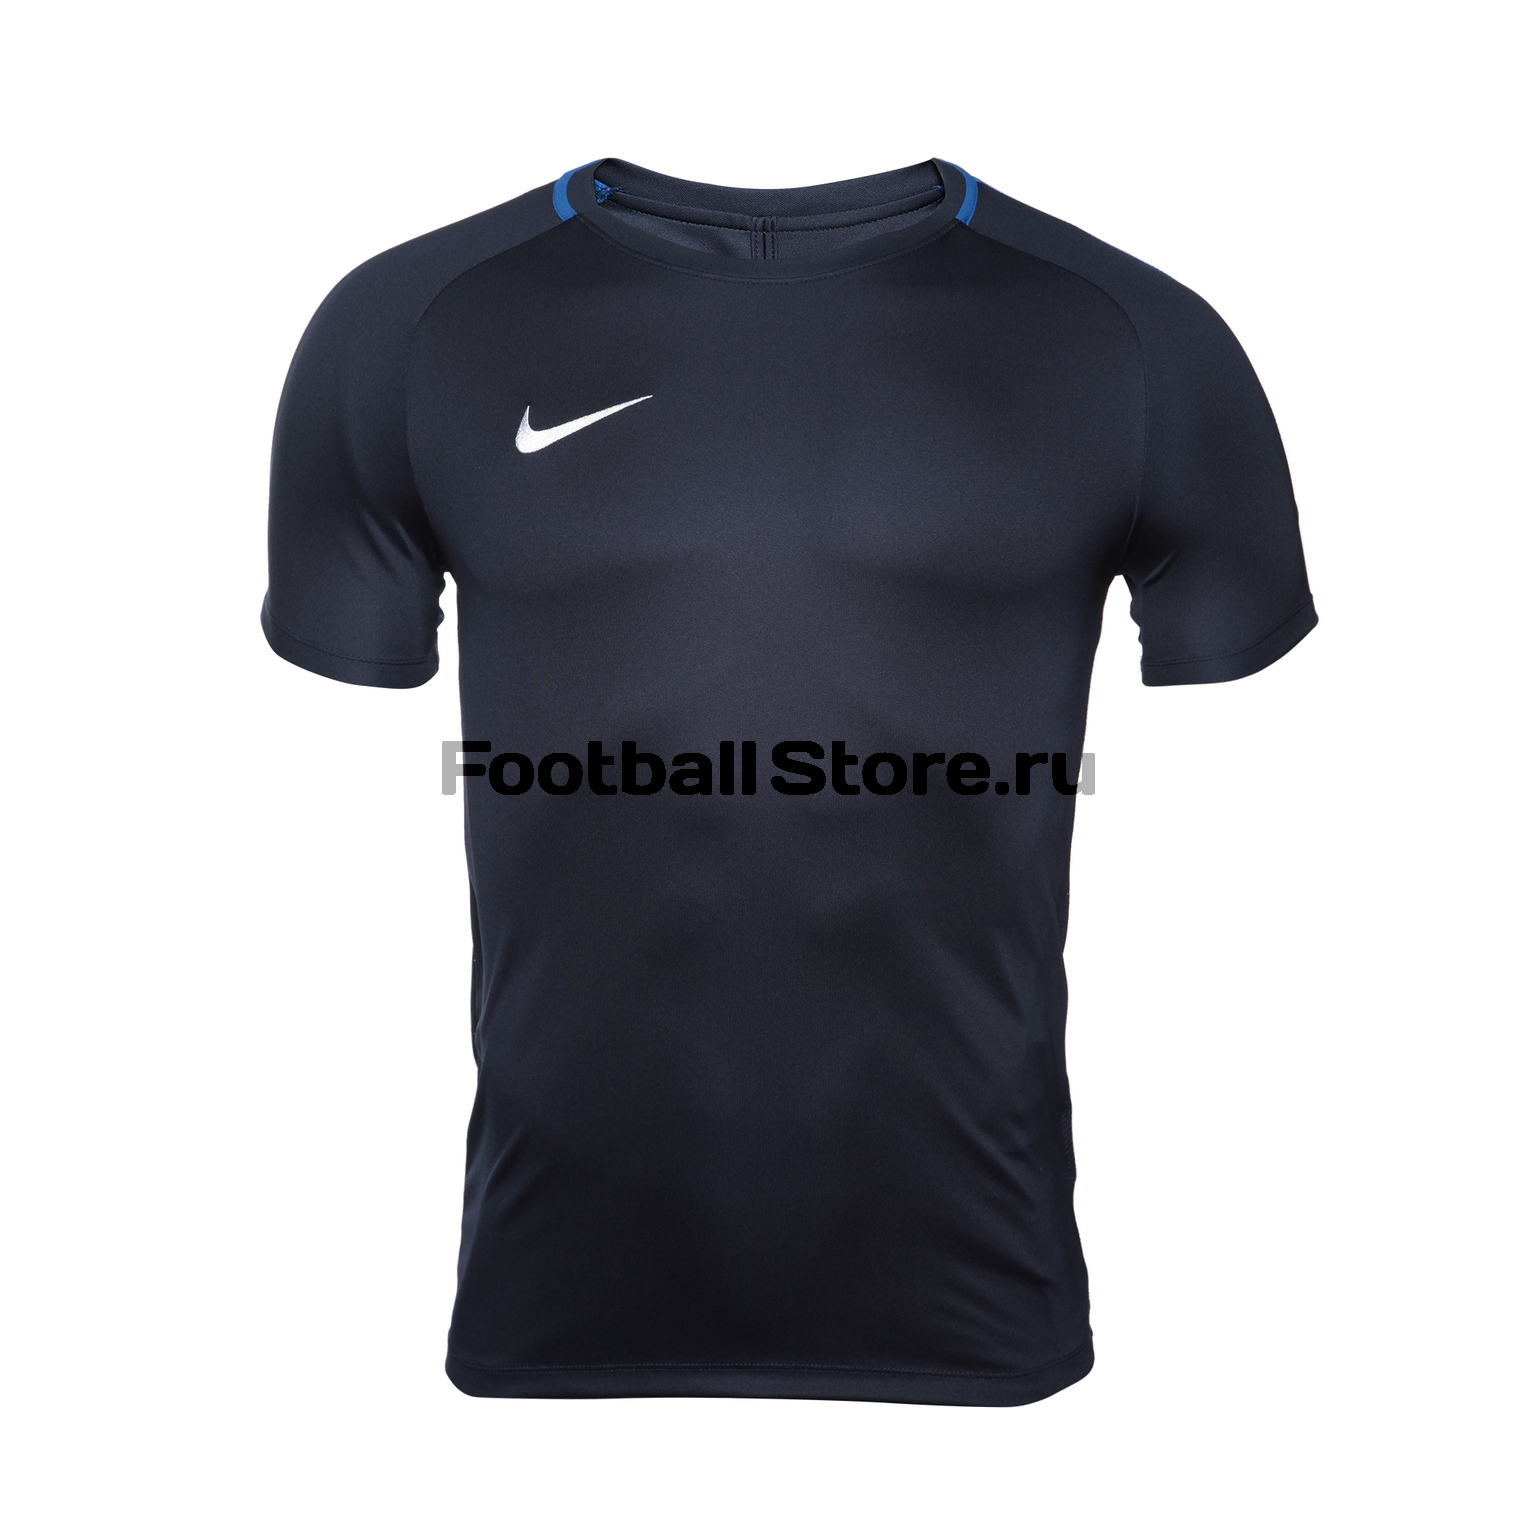 Футболка тренировочная Nike Dry Academy18 Top SS 893693-451 футболка хлопковая nike tee club19 ss aj1504 451